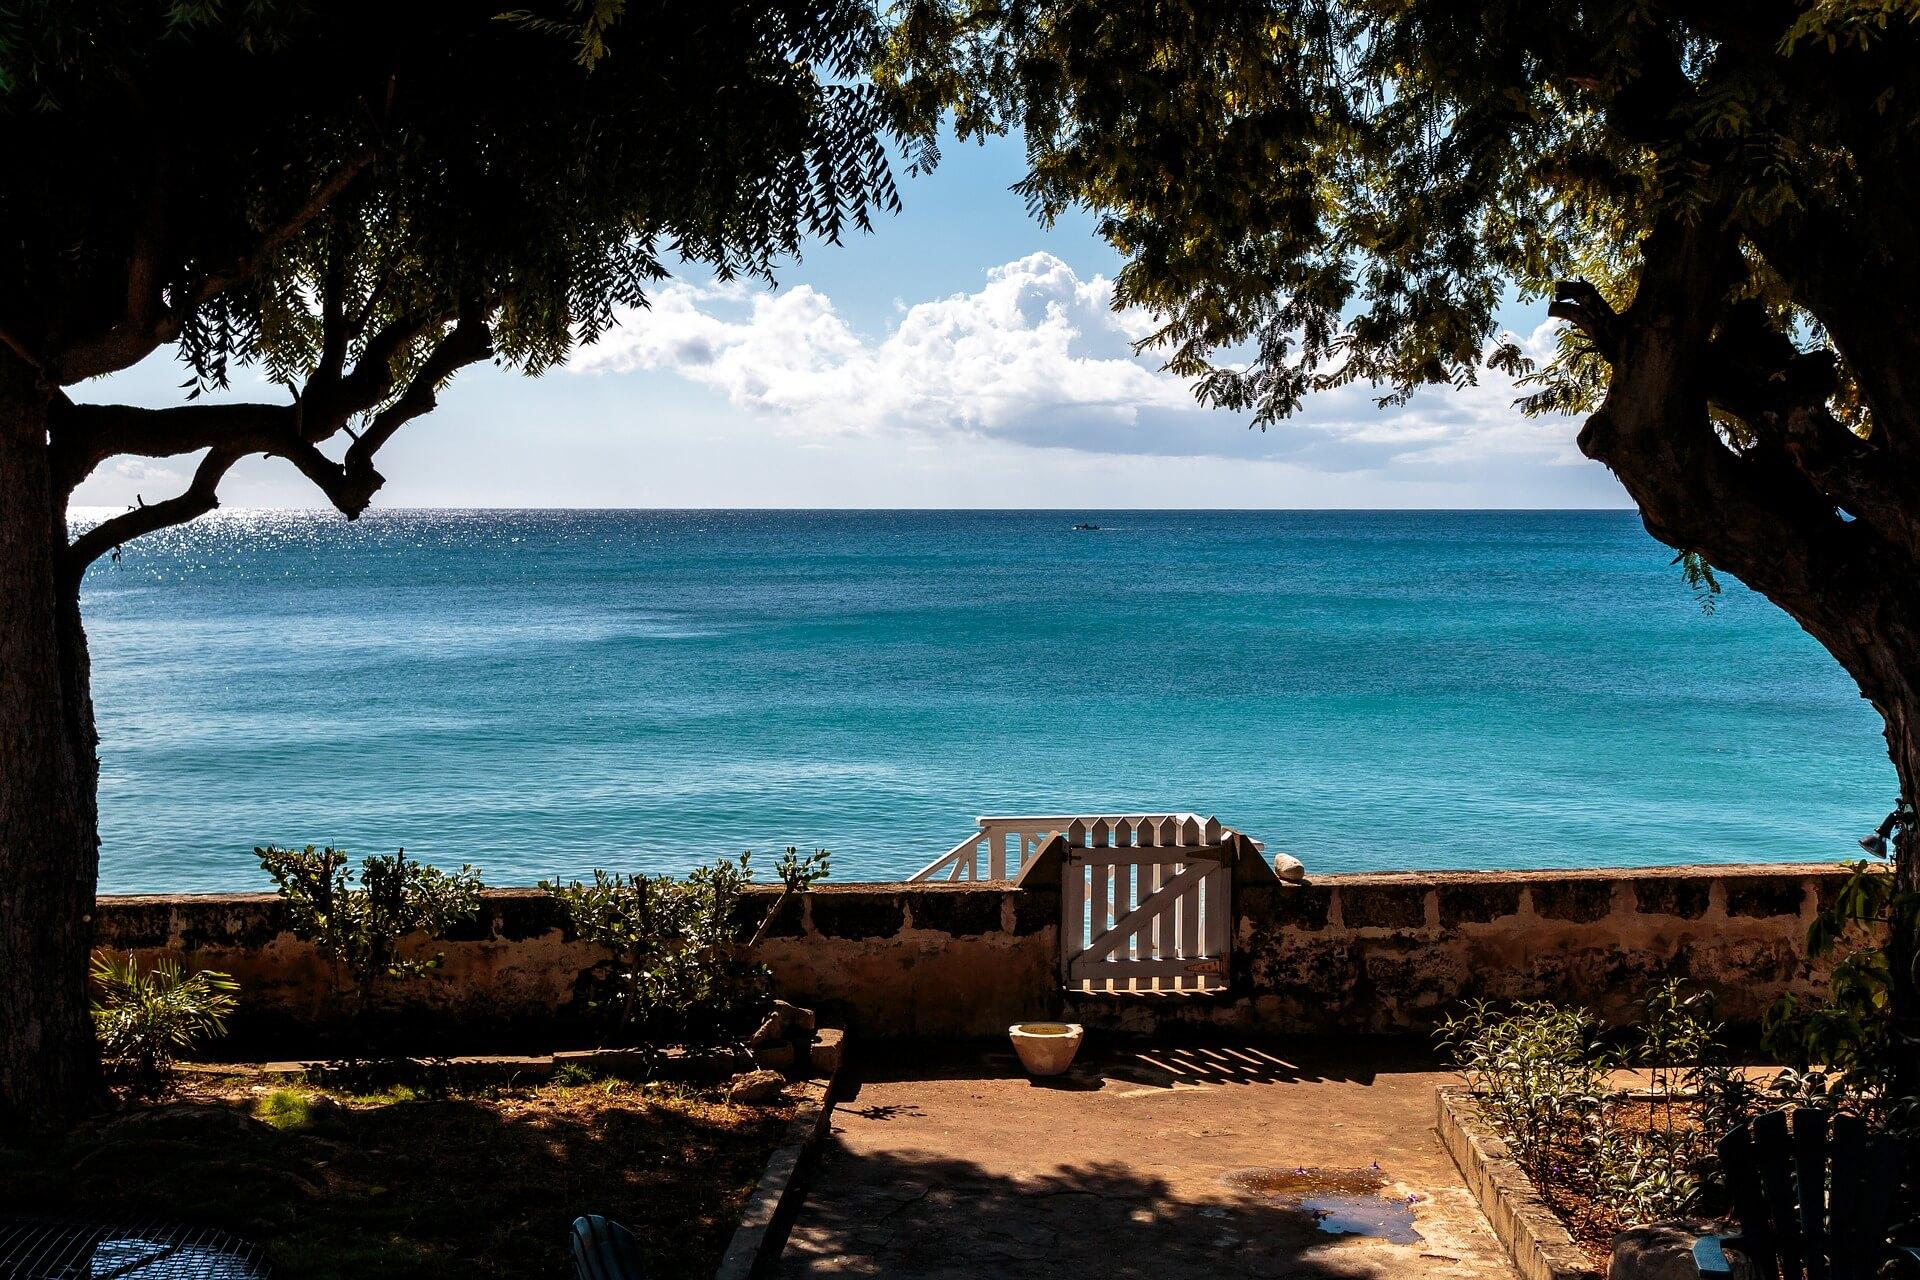 clearwater-villa-ocean-view-1549550_1920